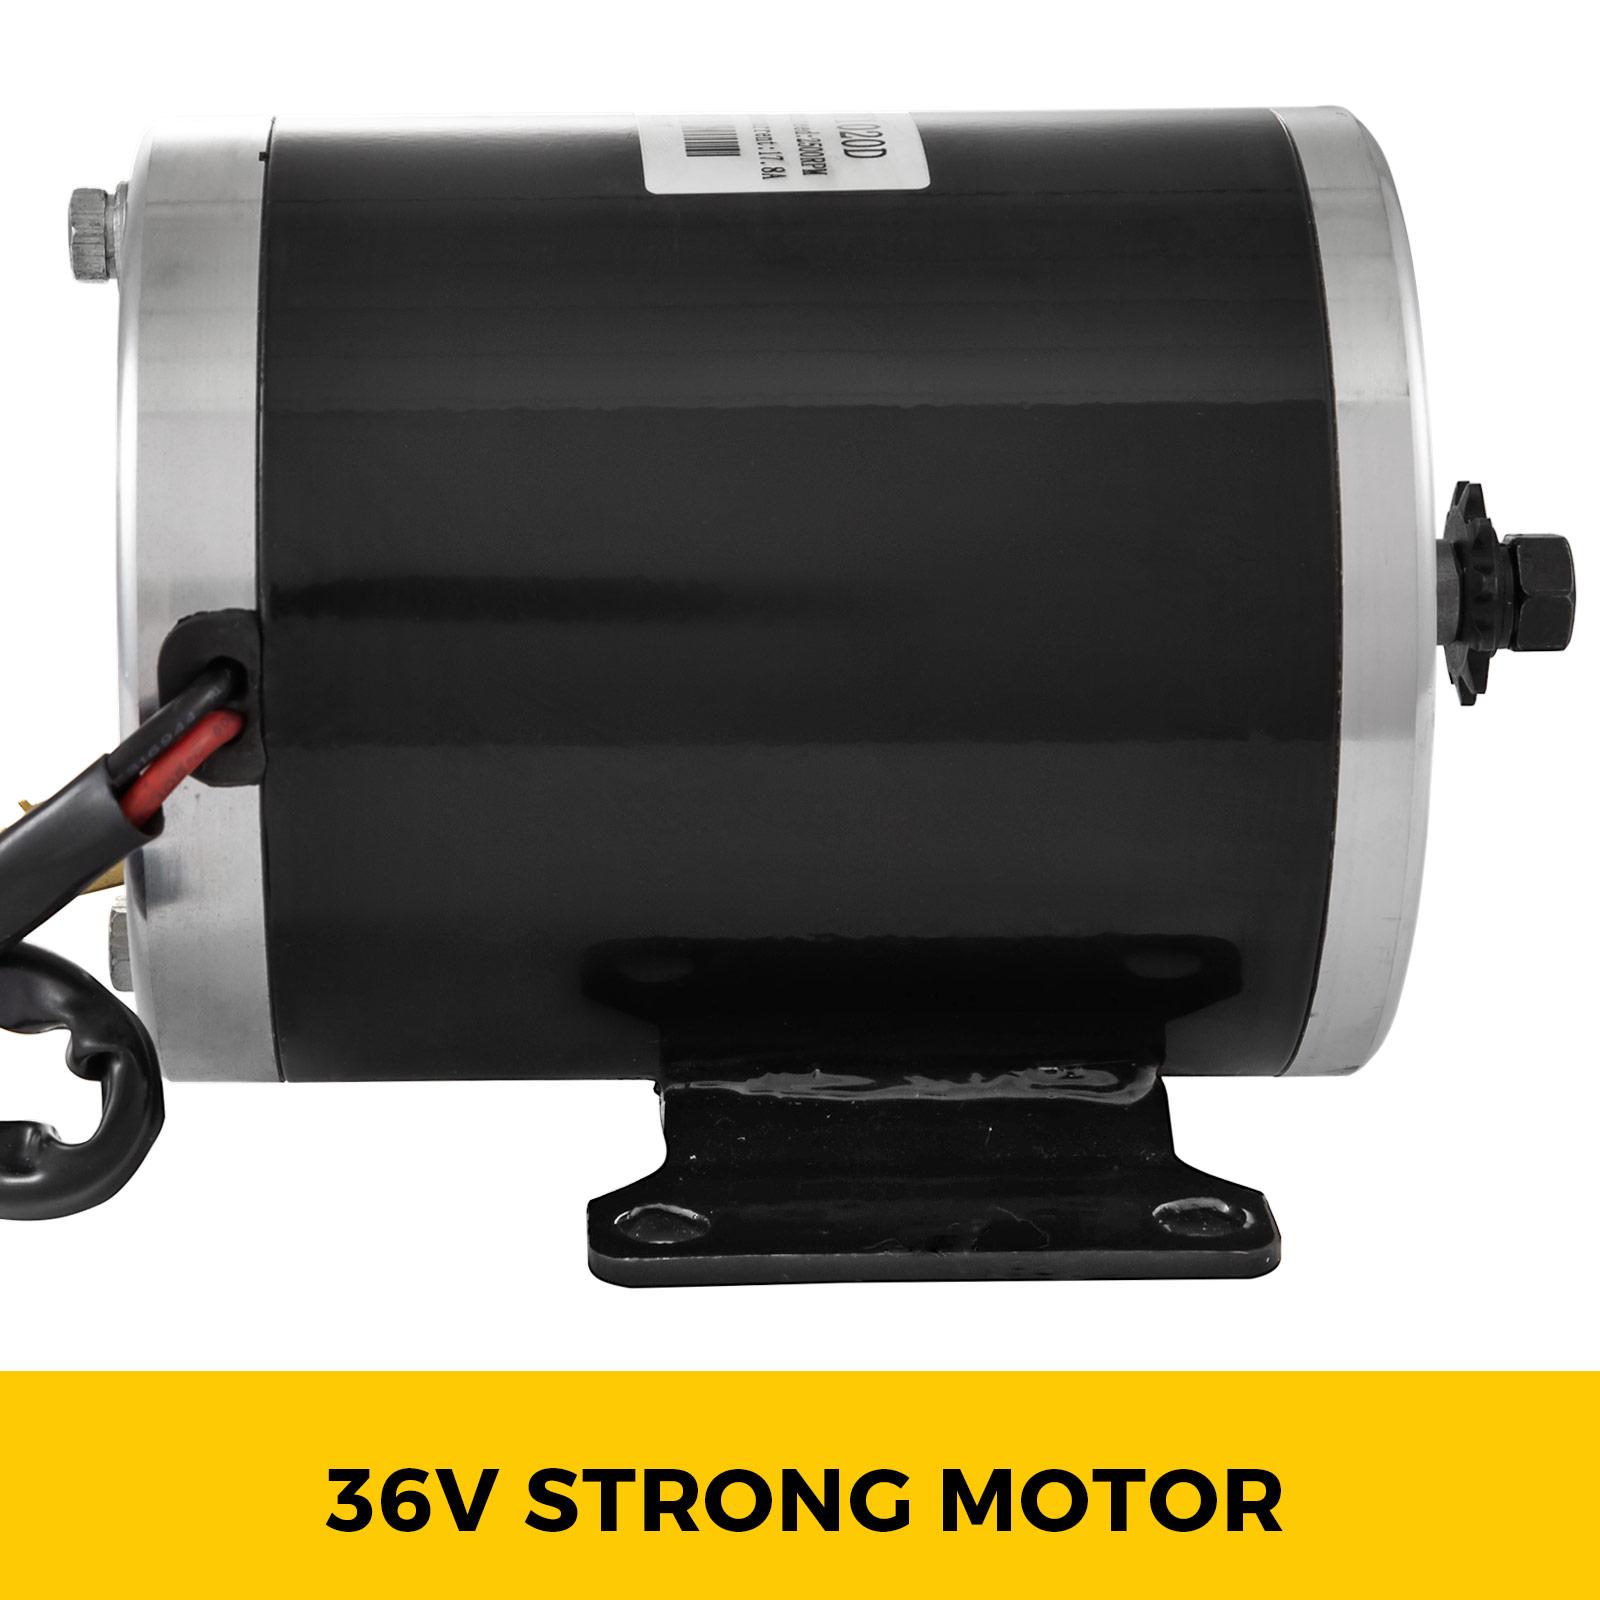 DC-electric-motor-12-60V-150W-2KW-for-scooter-bike-go-kart-minibike-e-ATV thumbnail 86